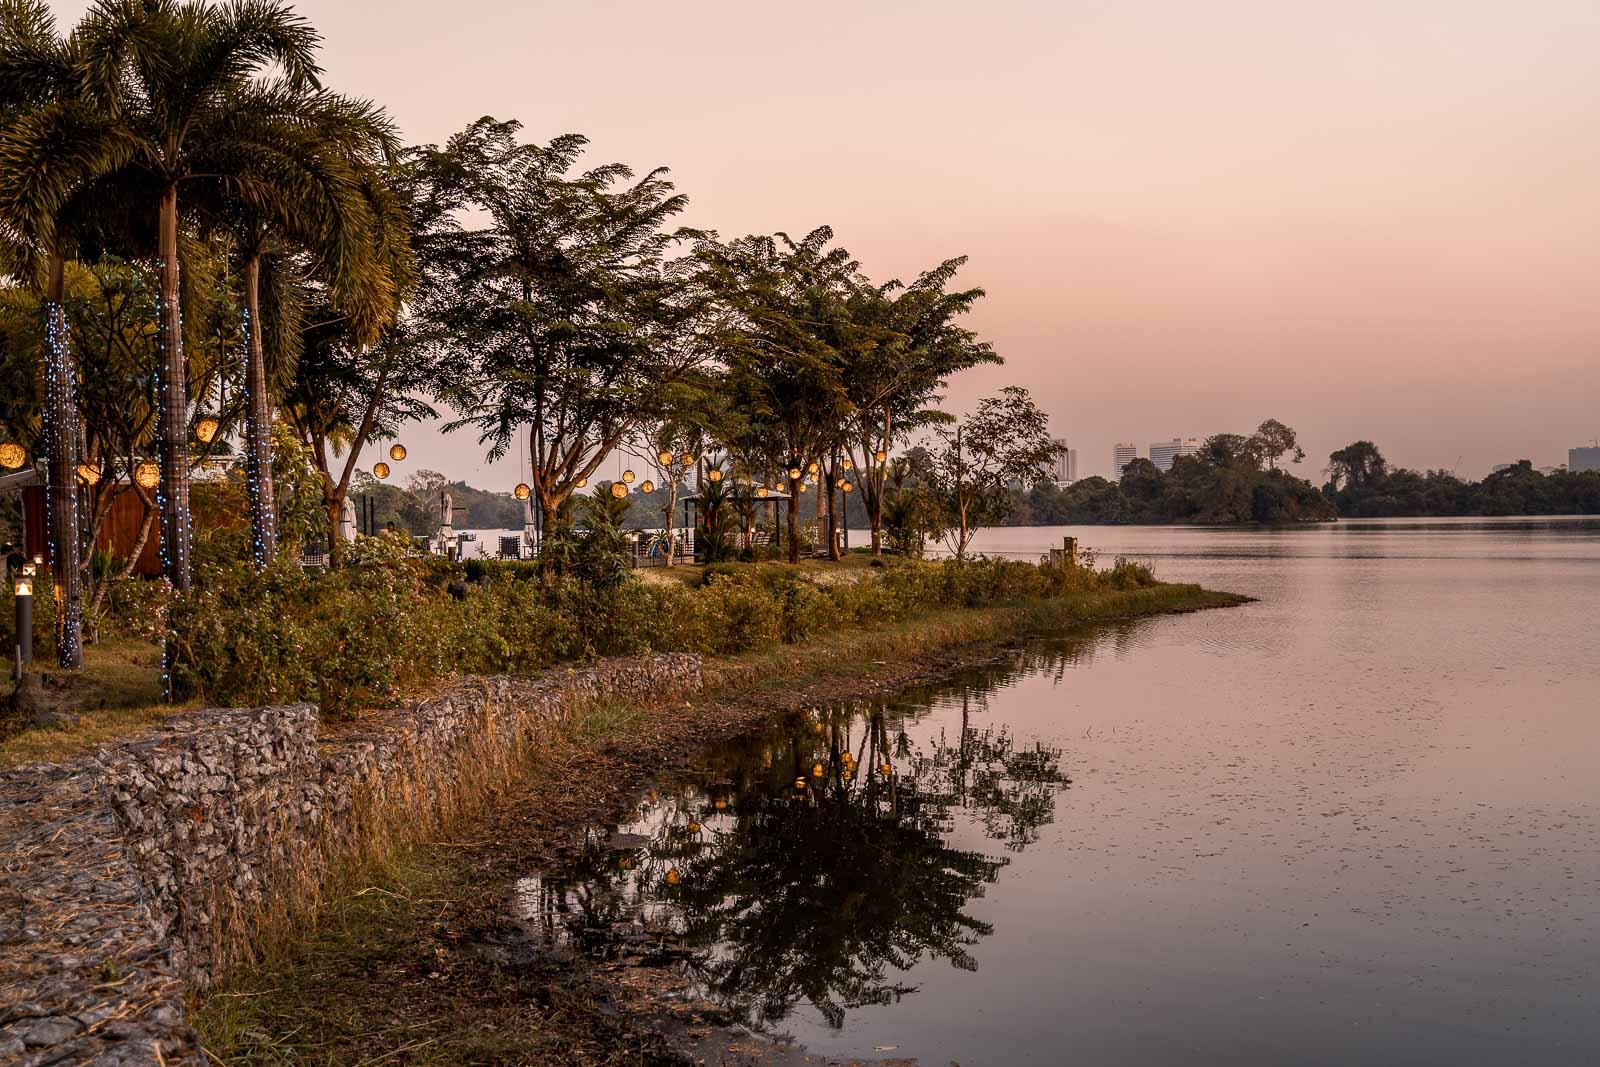 Sunset at the Lotte Hotel Yangon 2